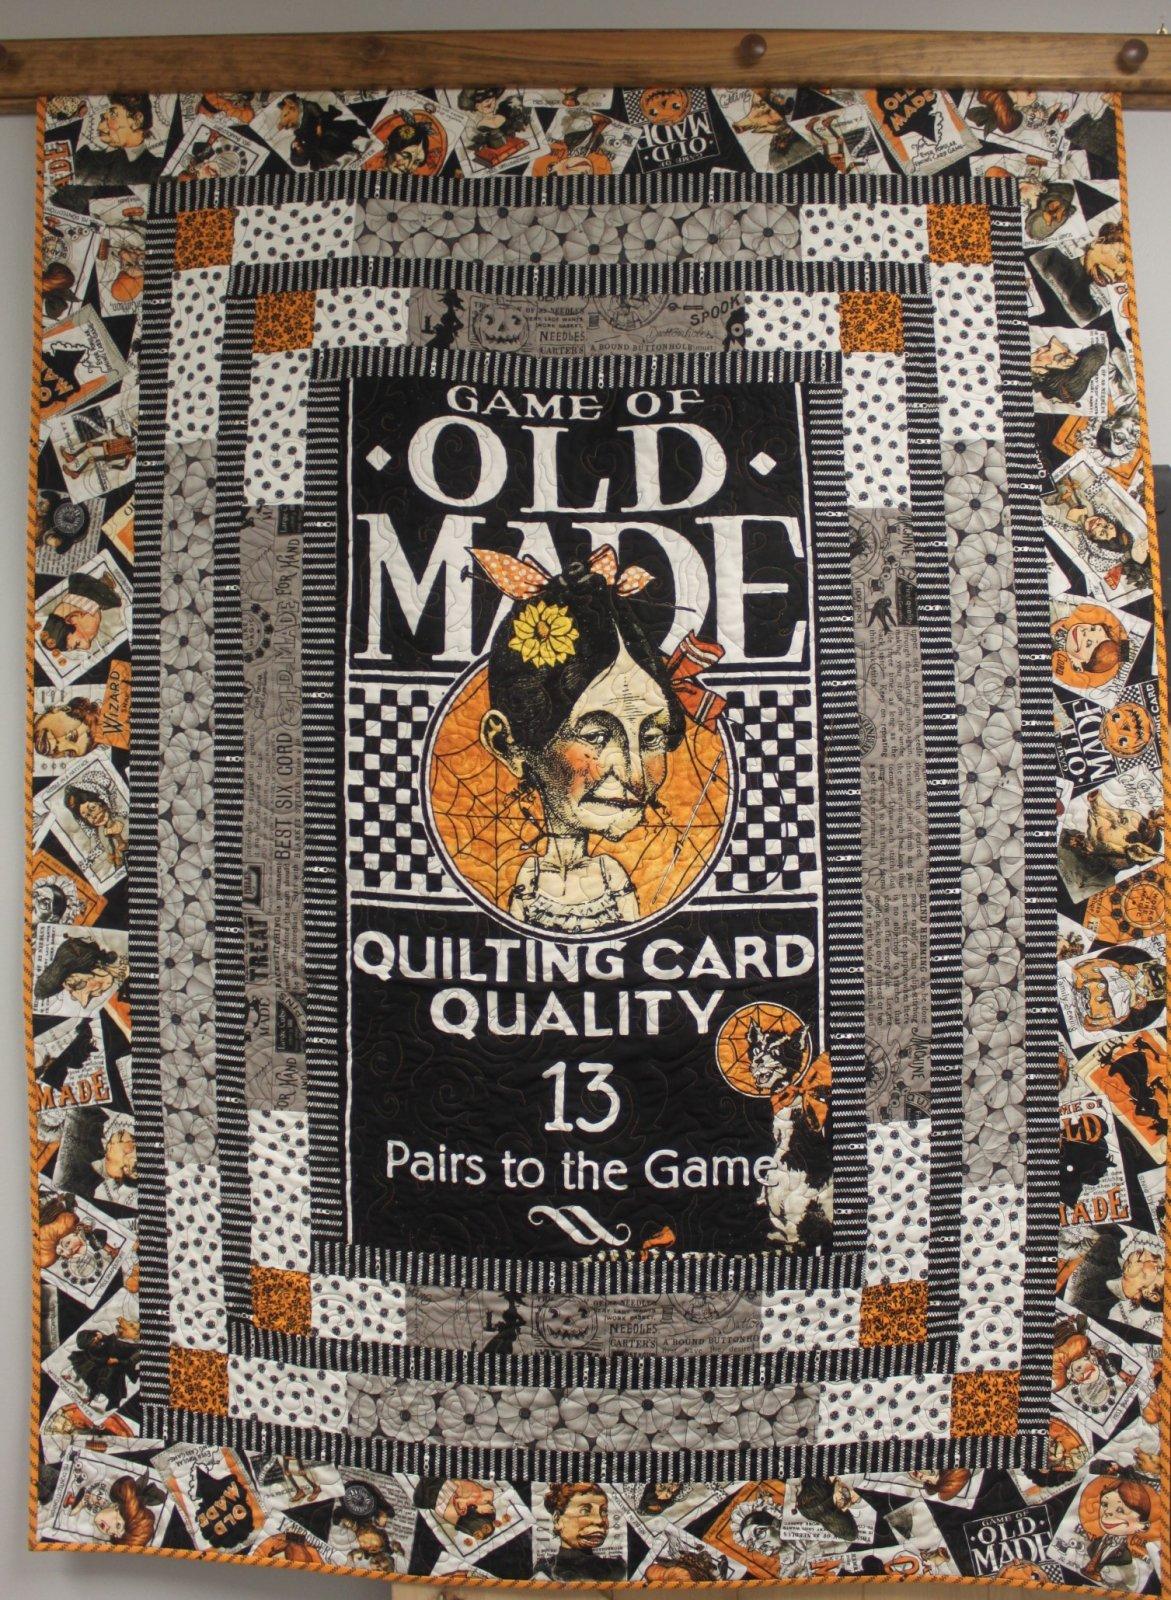 Old Made Bevels Quilt Kit